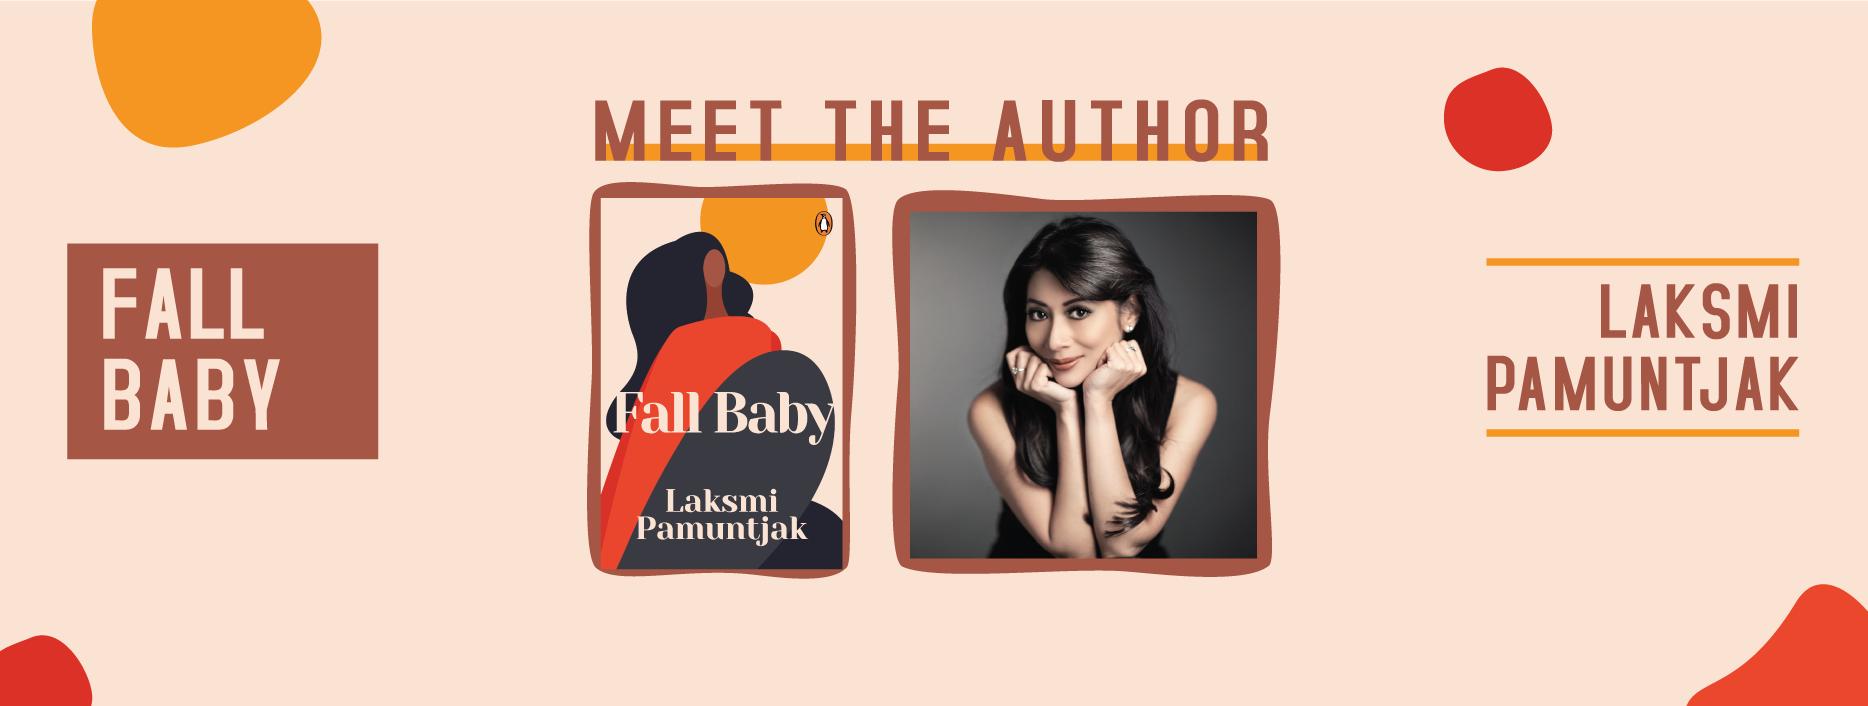 Book Launch: Fall Baby by Laksmi Pamuntjak